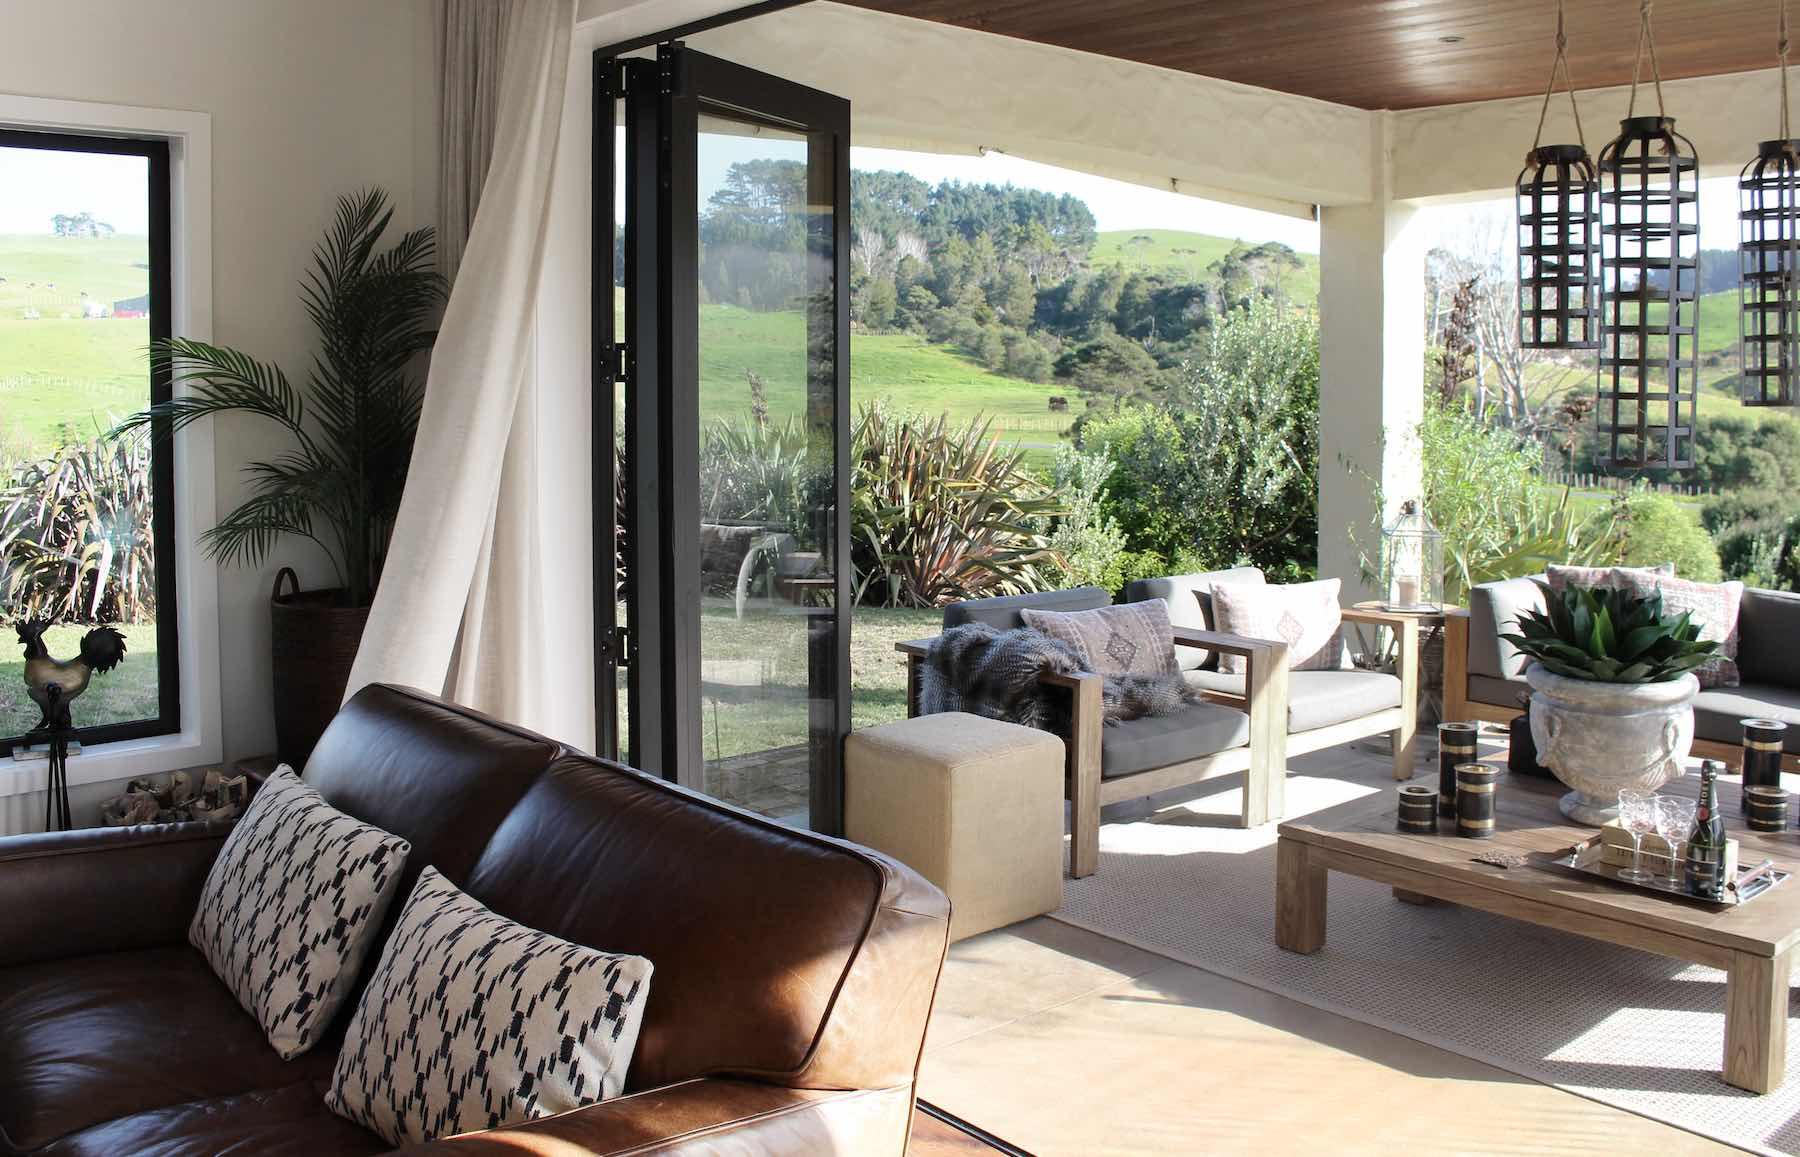 lou-brown-design-hayley-auckland-interior-design-entrepreneur-8